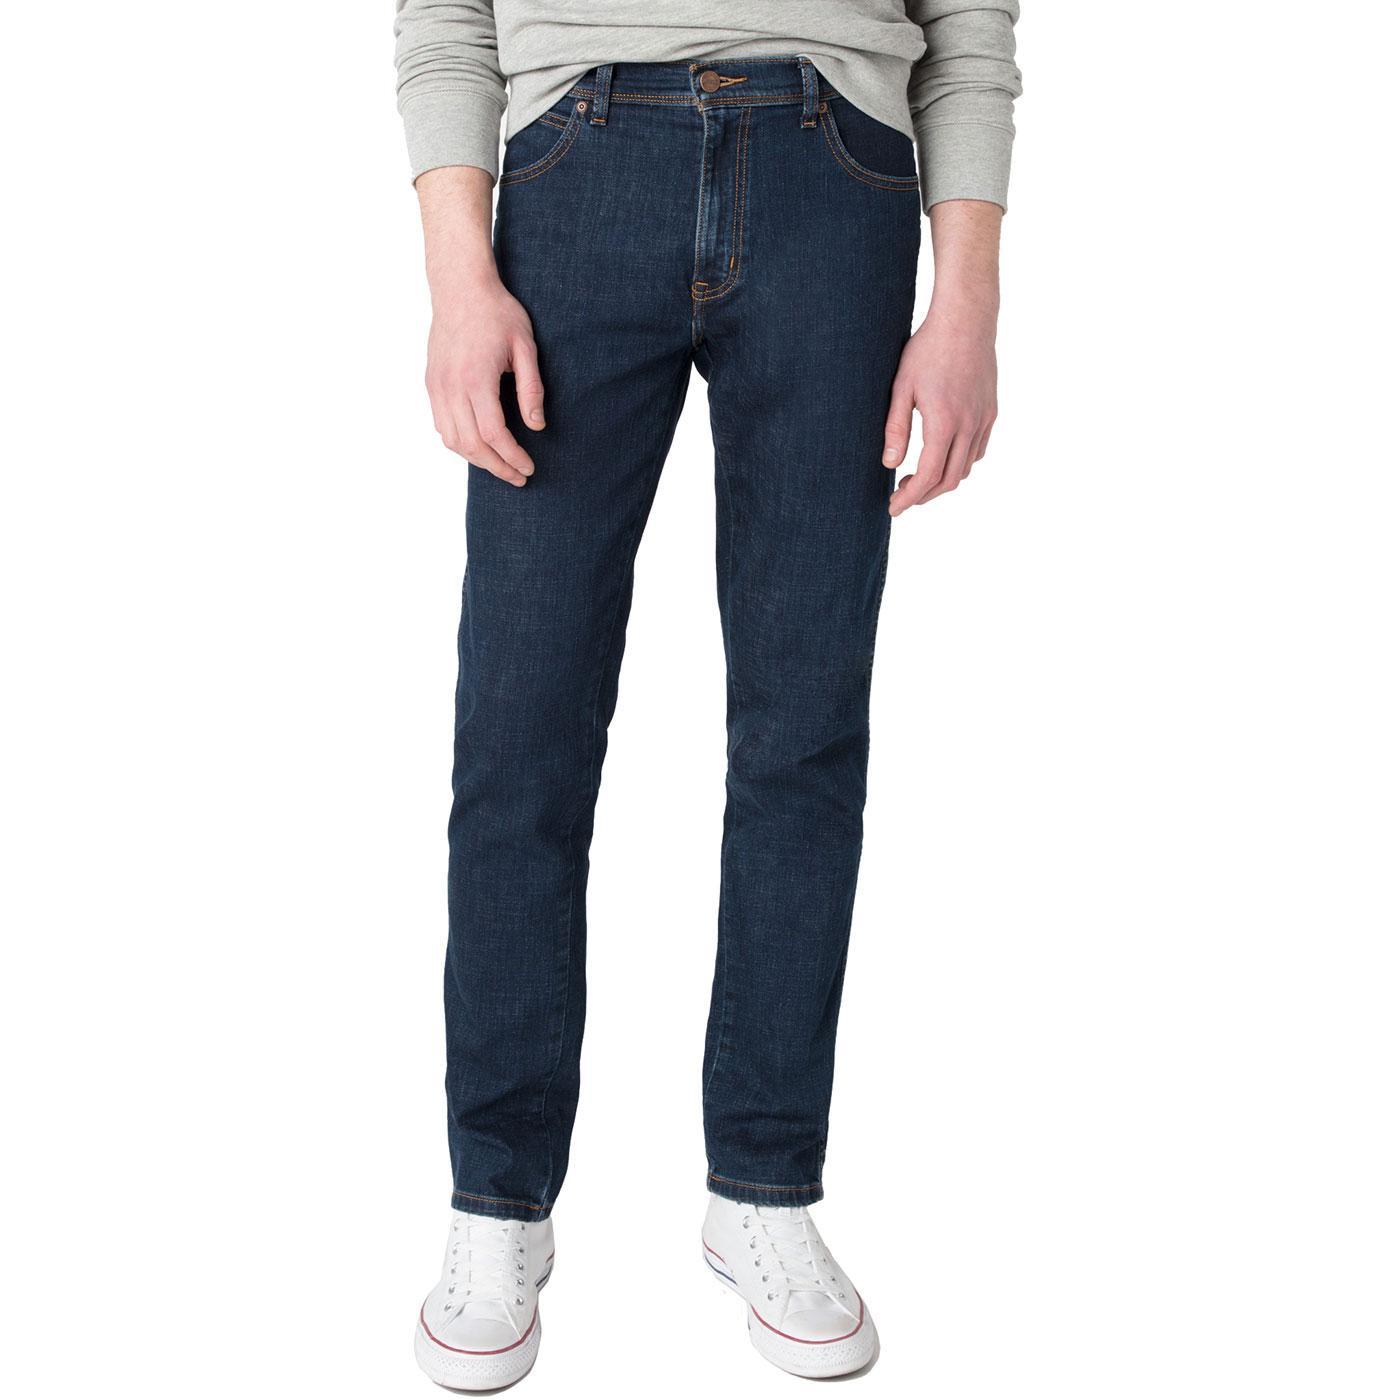 Texas WRANGLER Authentic Slim Denim Jeans CG